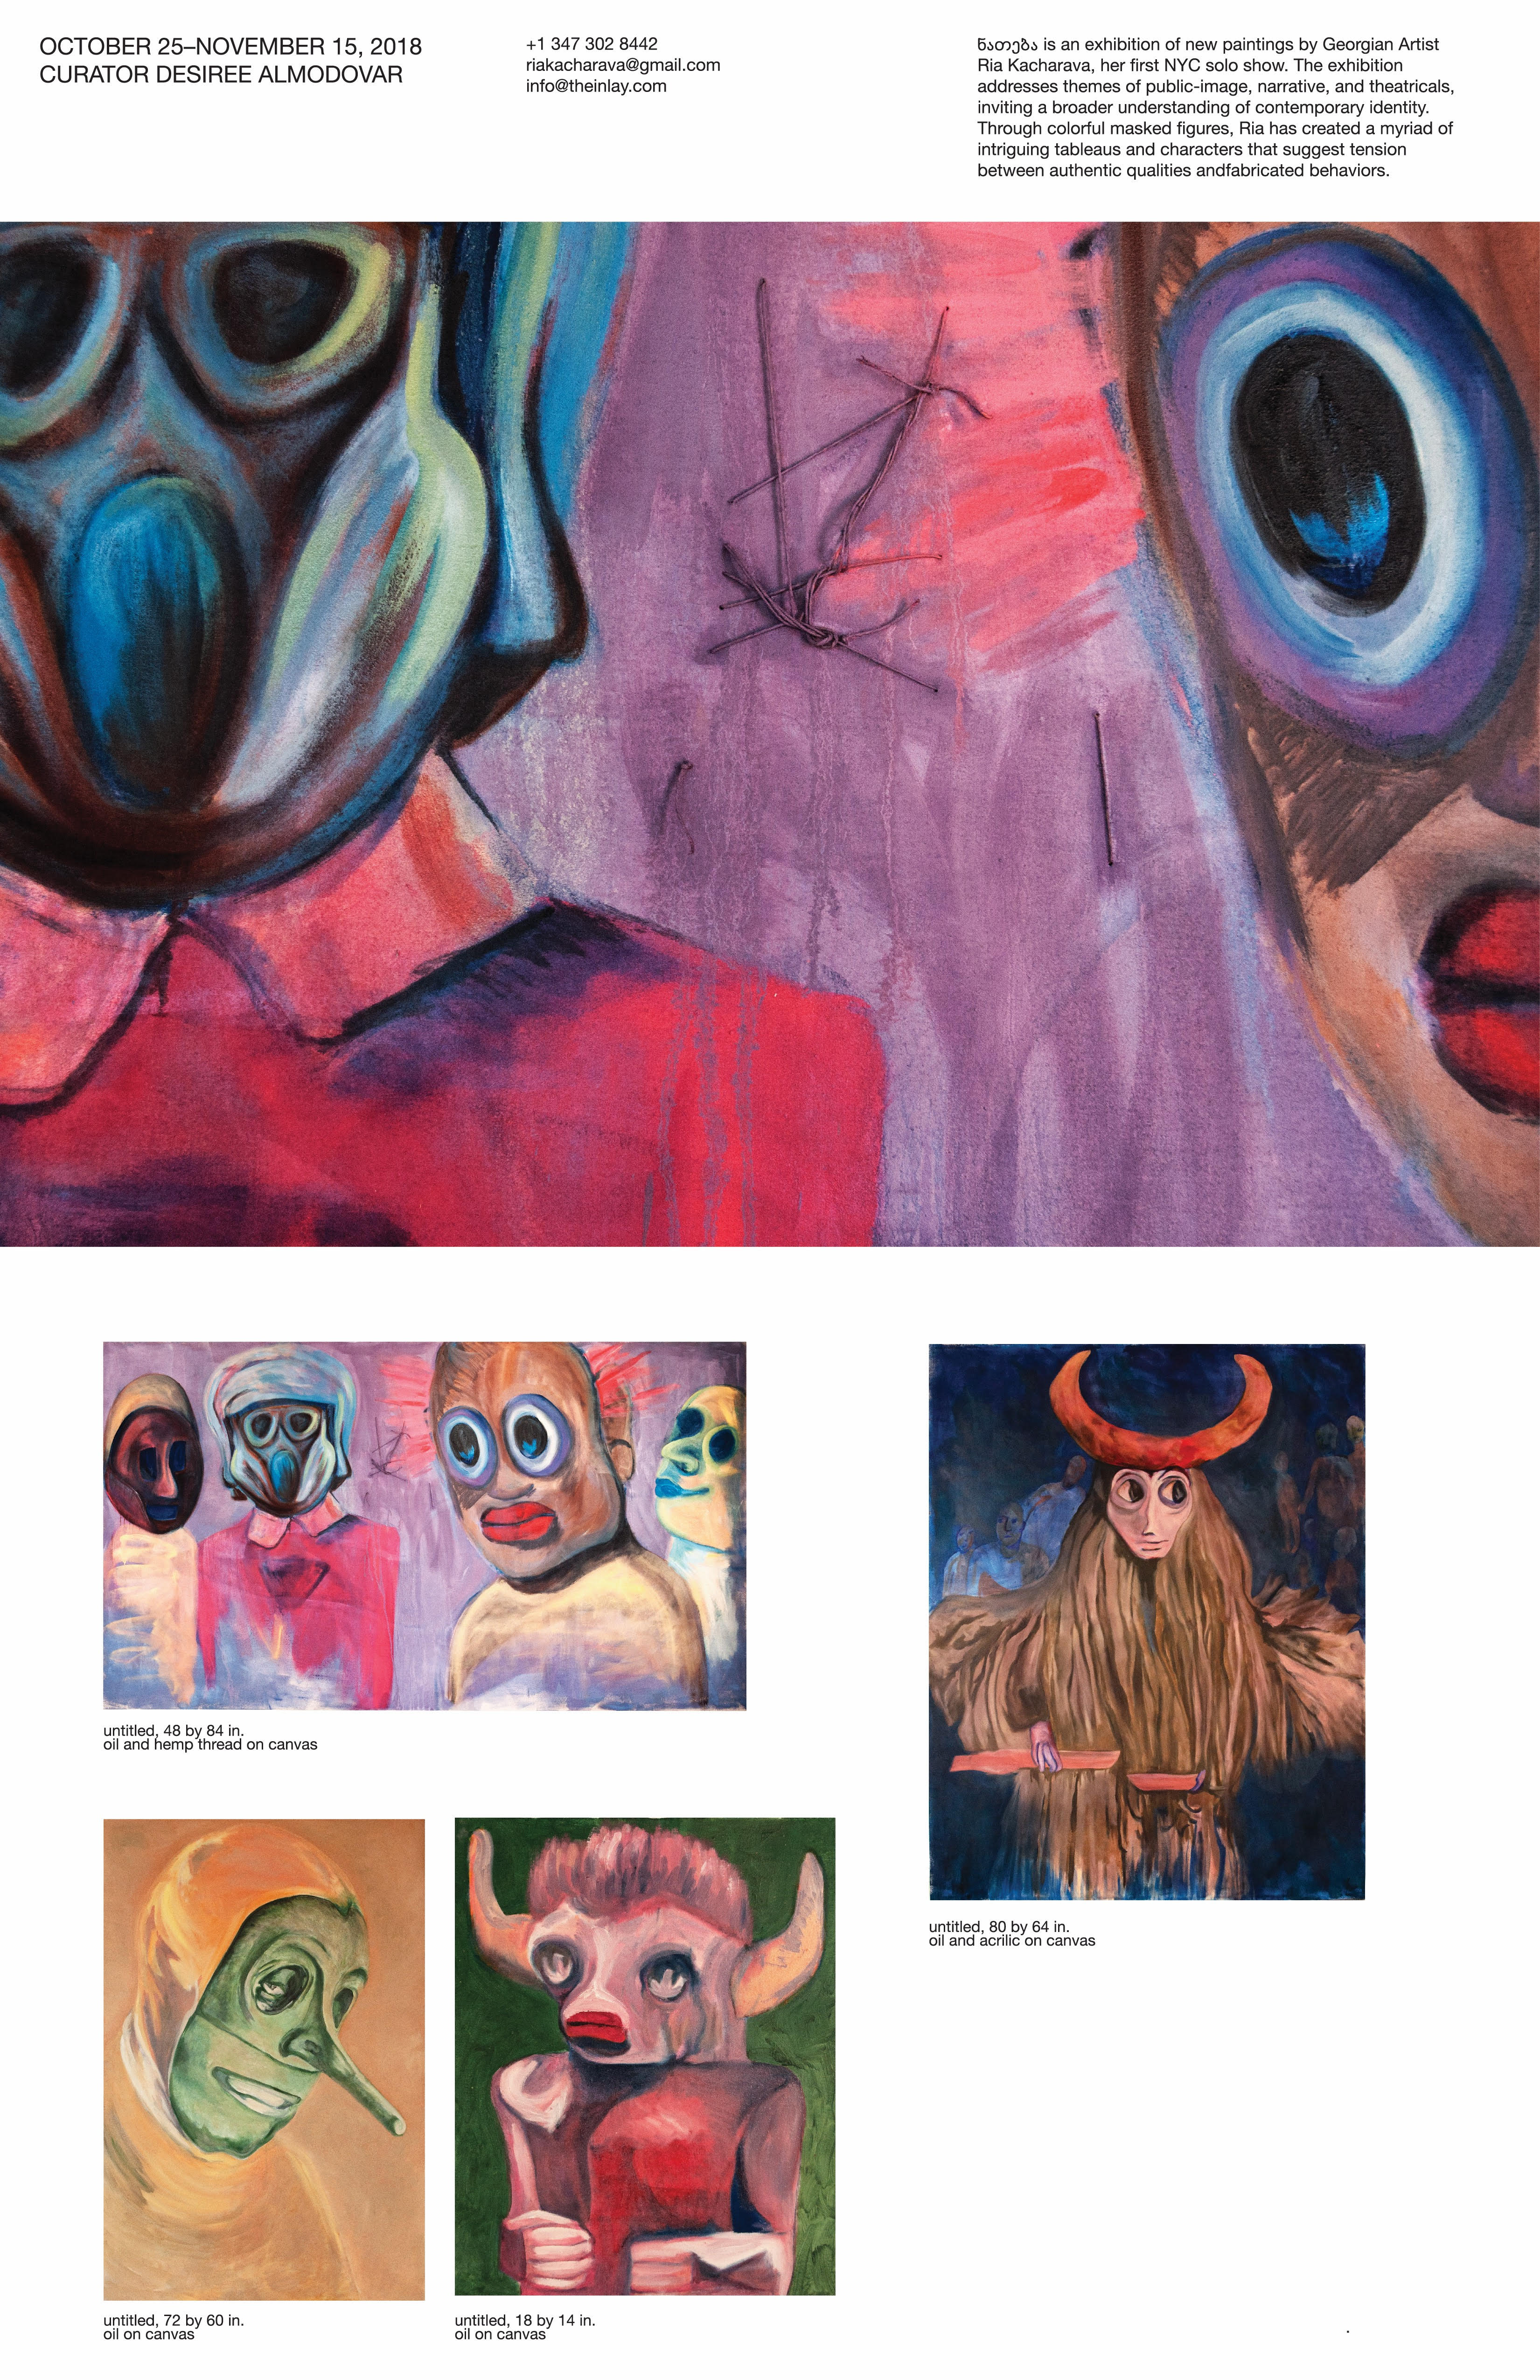 Ria Kacharava 2 #art живопись, искусство, Нью-Йорк, Риа Качарава, сша